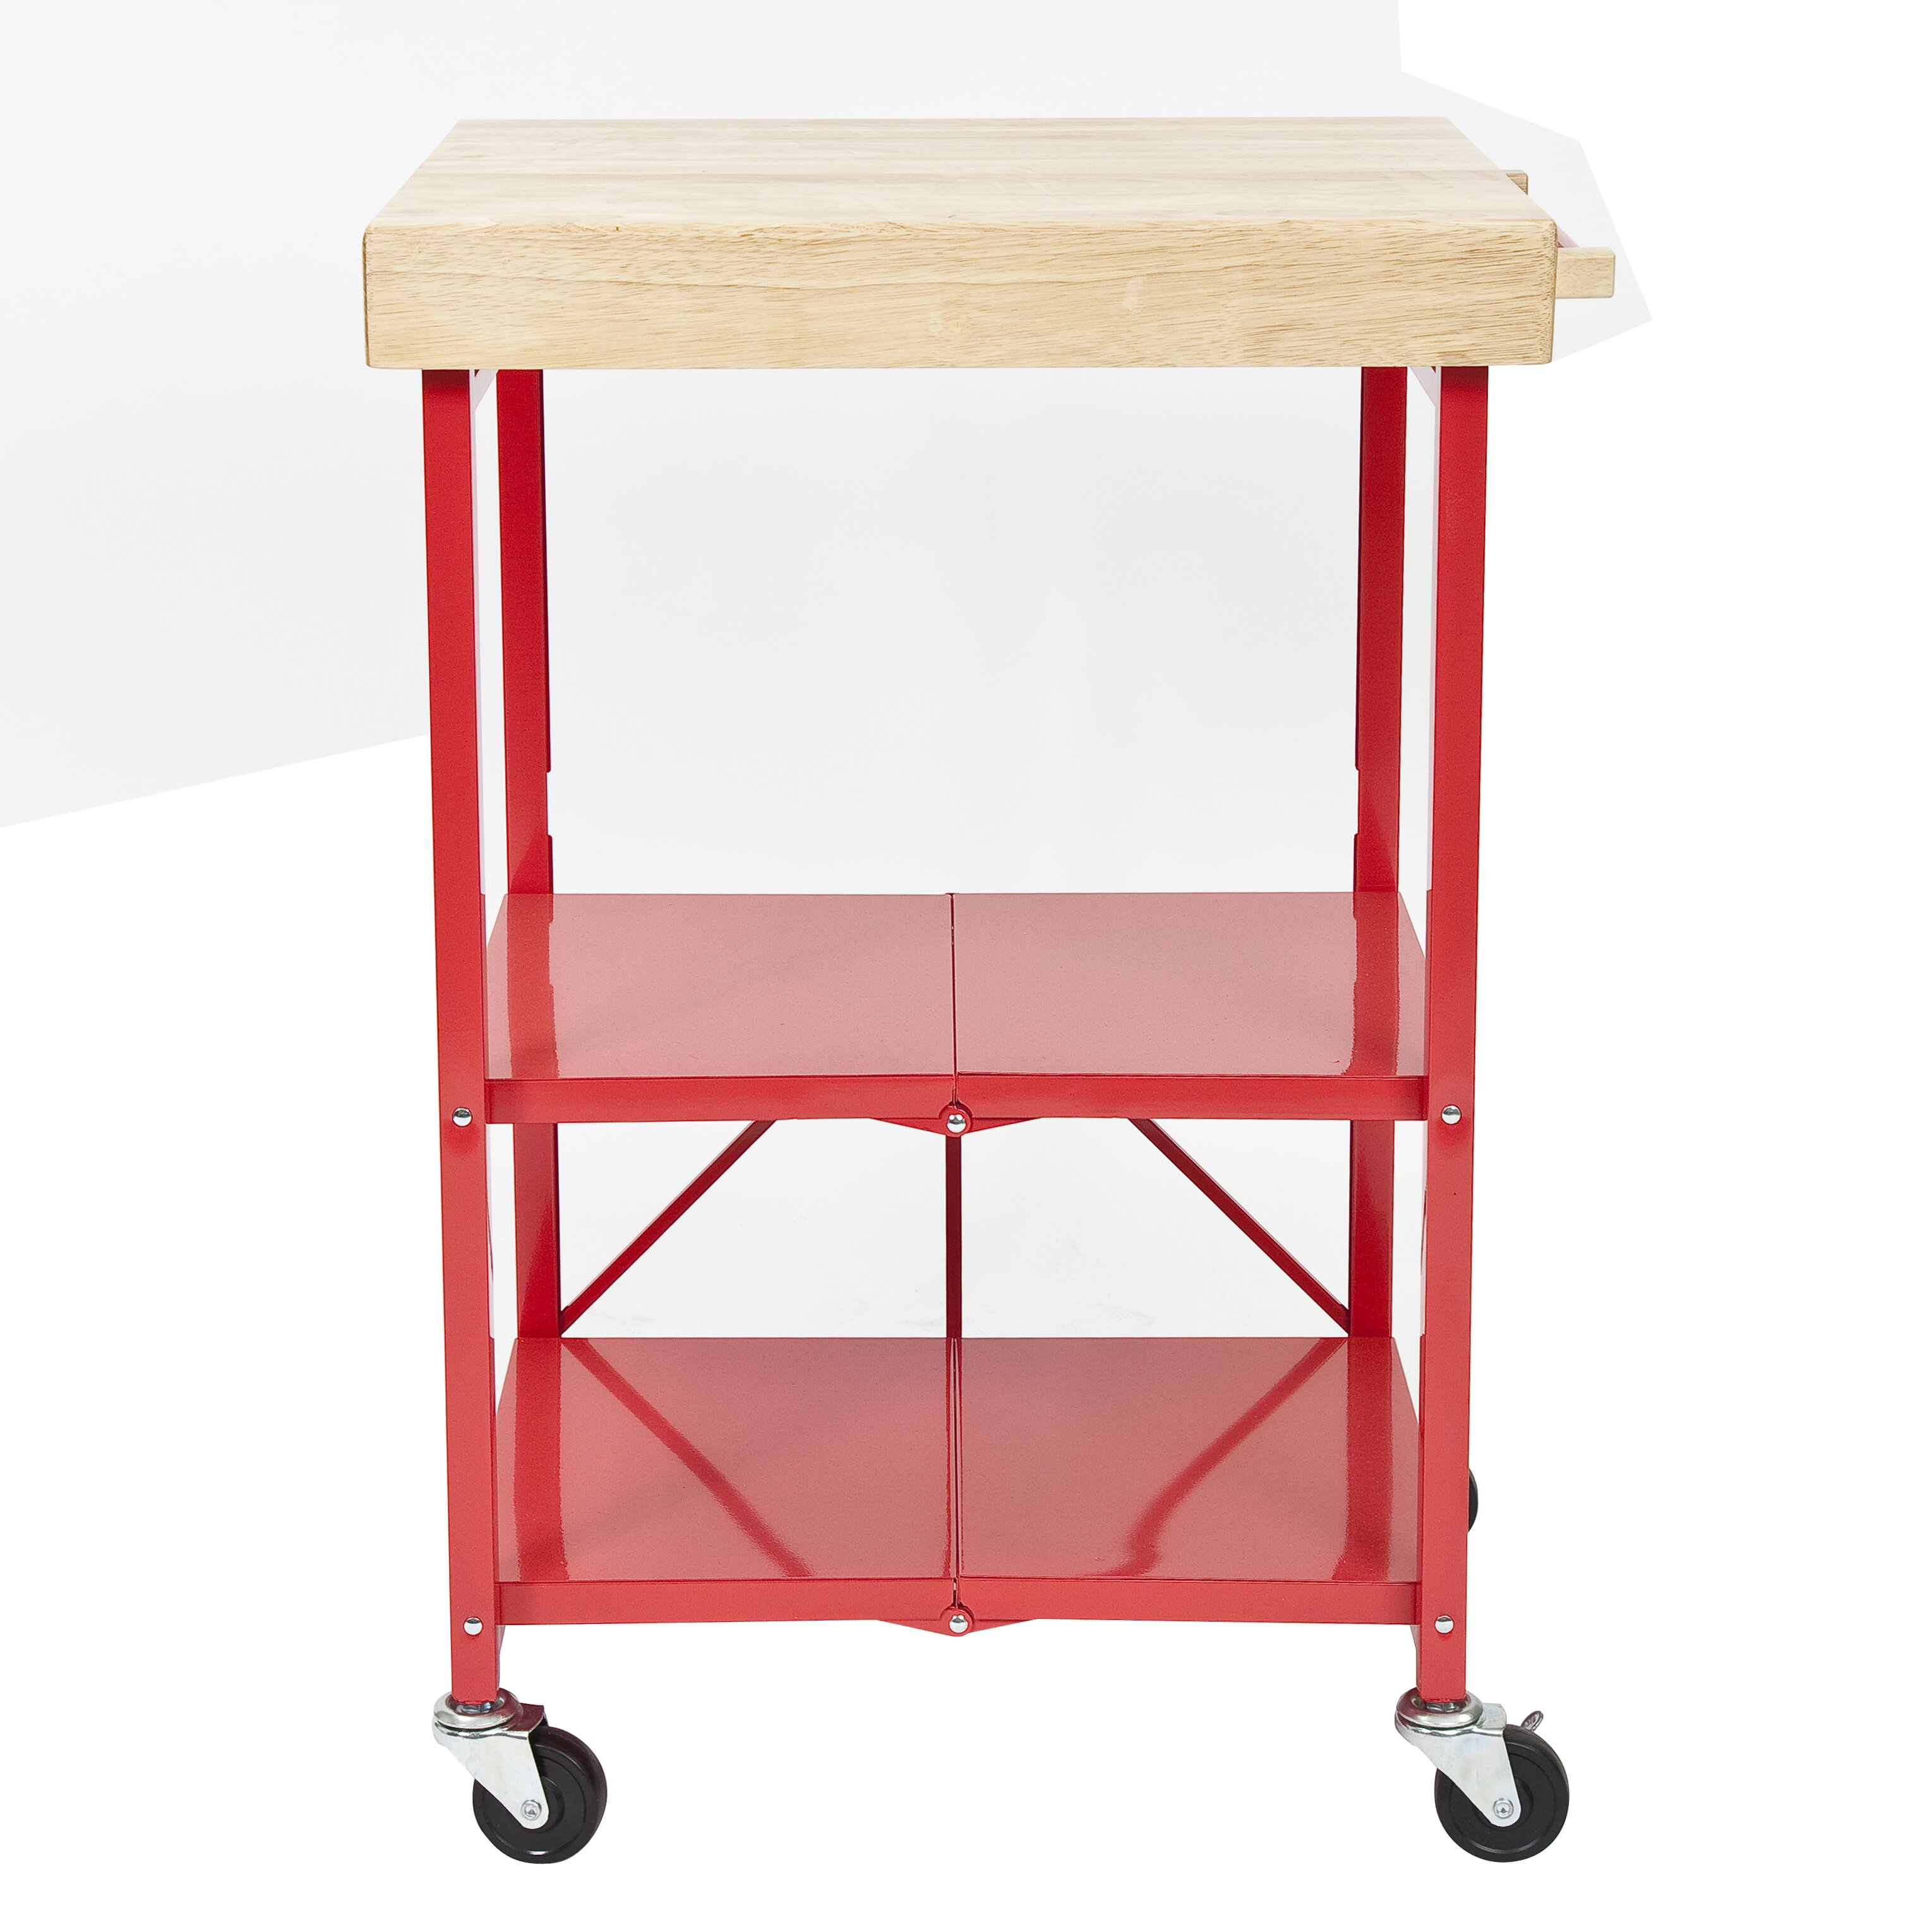 Origami Kitchen Cart with Wood Top & Reviews | Wayfair - photo#17